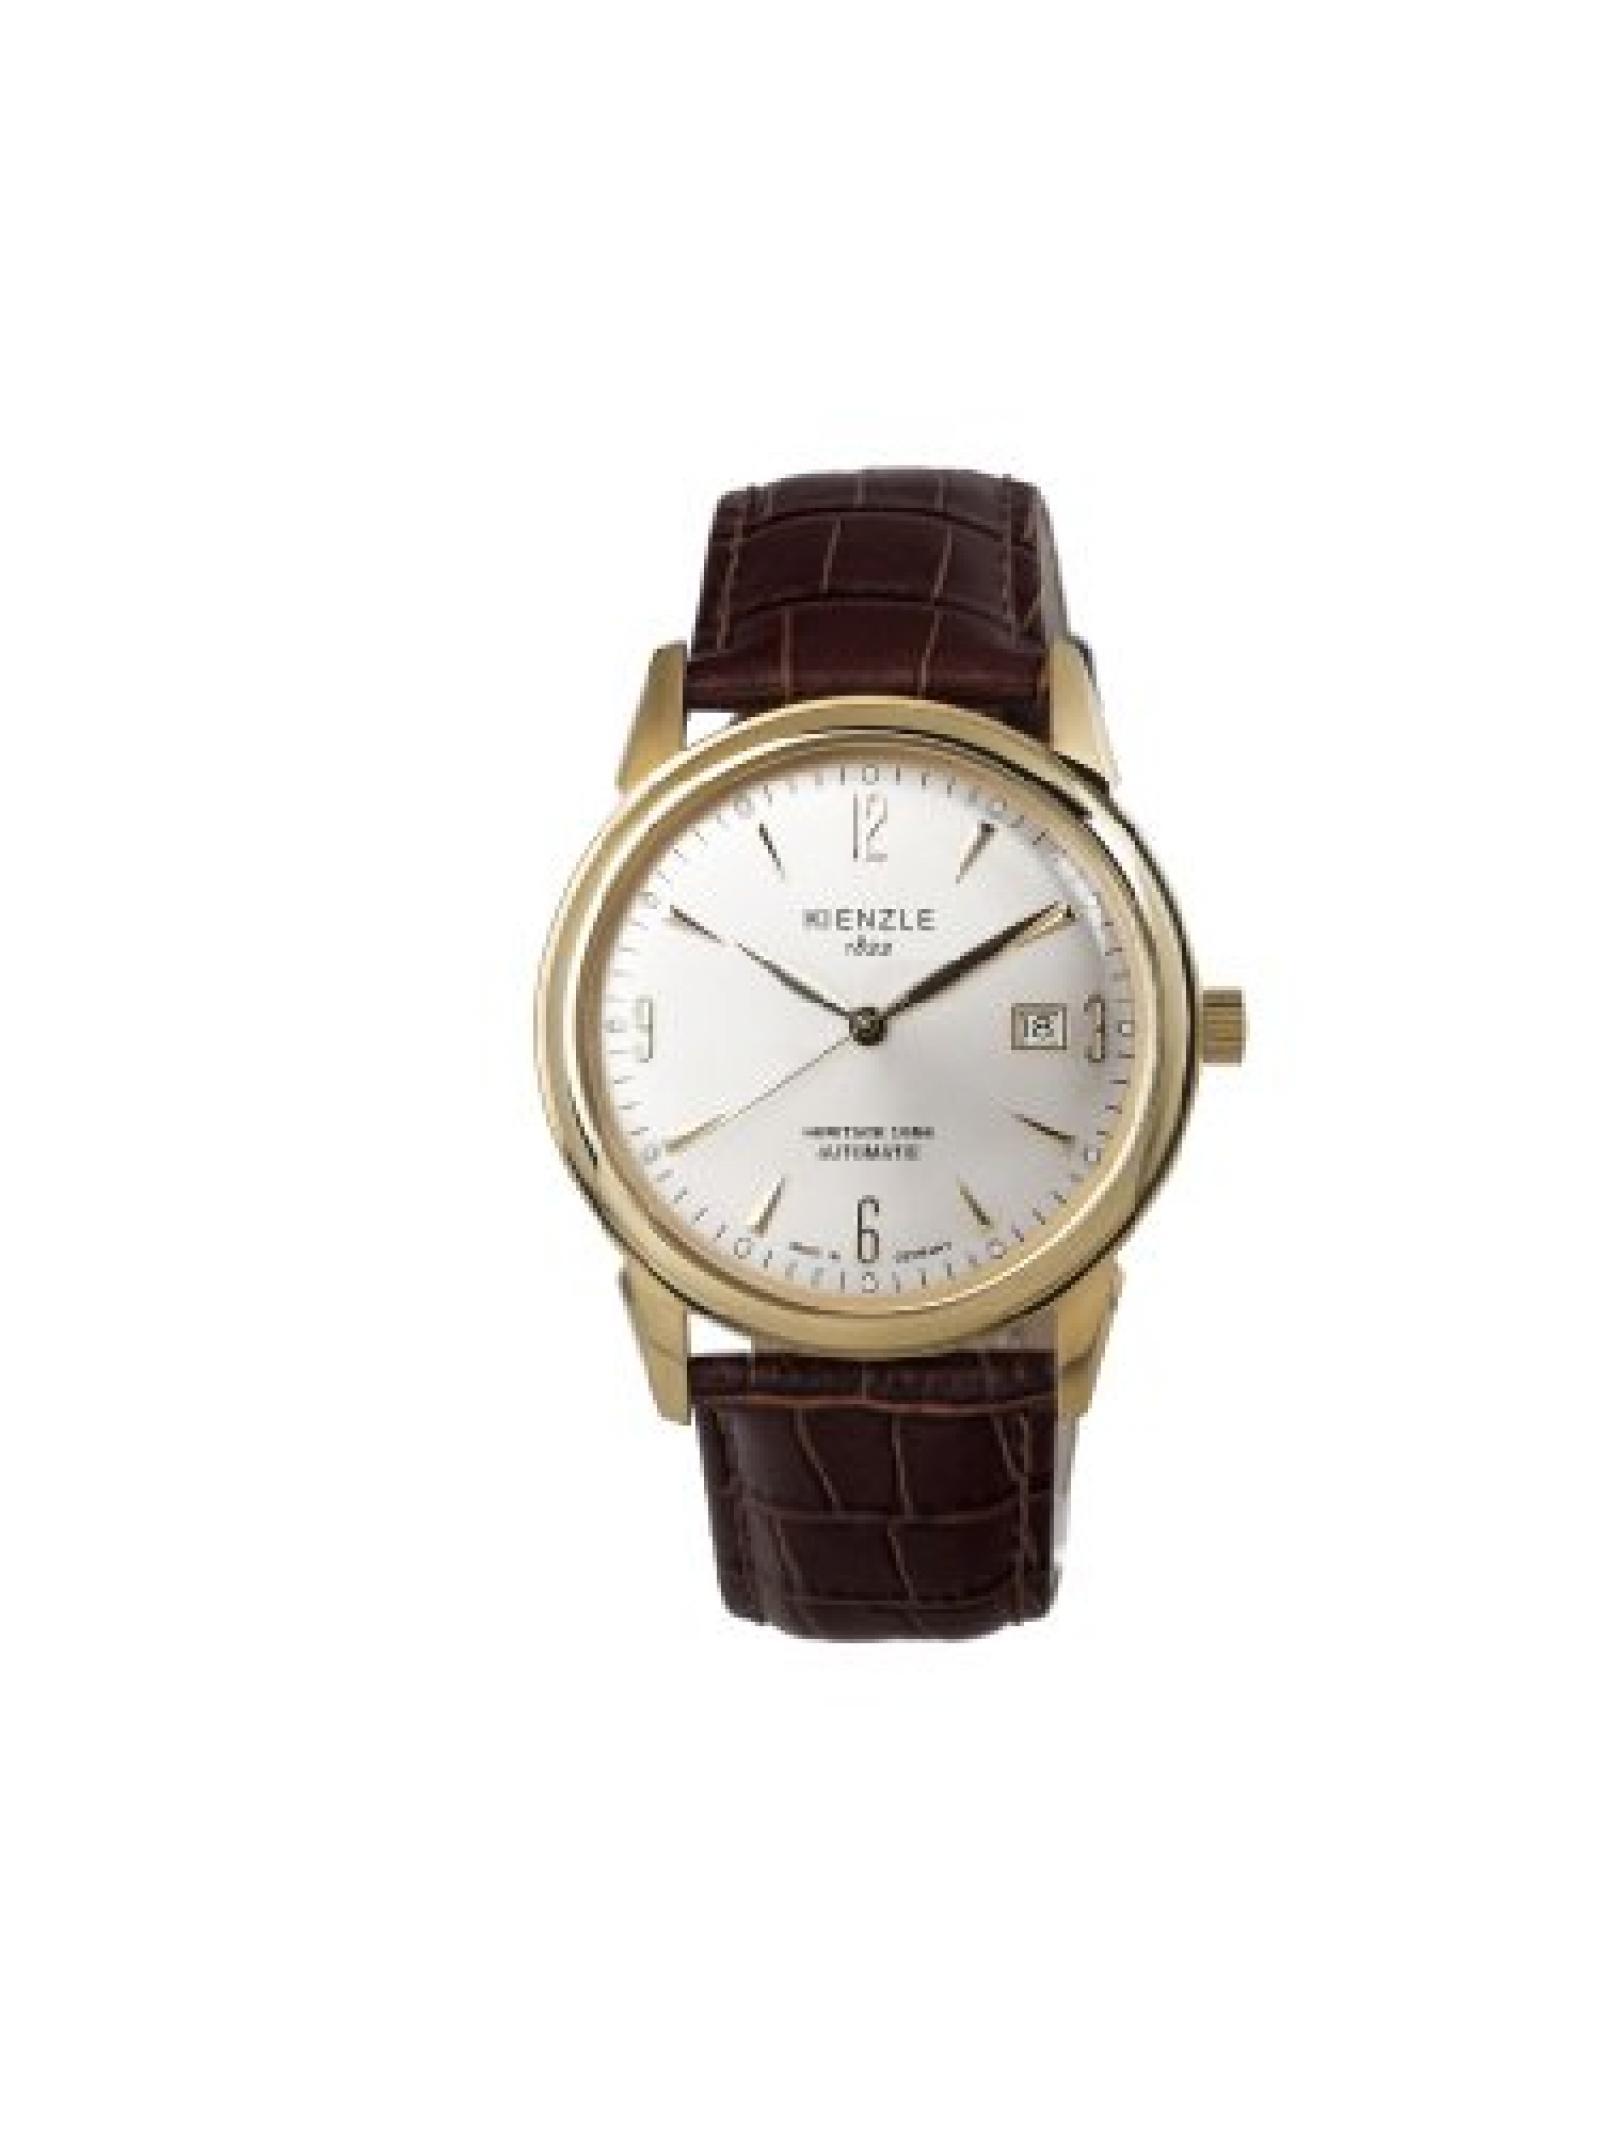 Kienzle Damen-Armbanduhr XS KIENZLE 1822 Automatik - Heritage 1956 Analog Automatik Lederarmband  Made in Germany K9112021041-00342